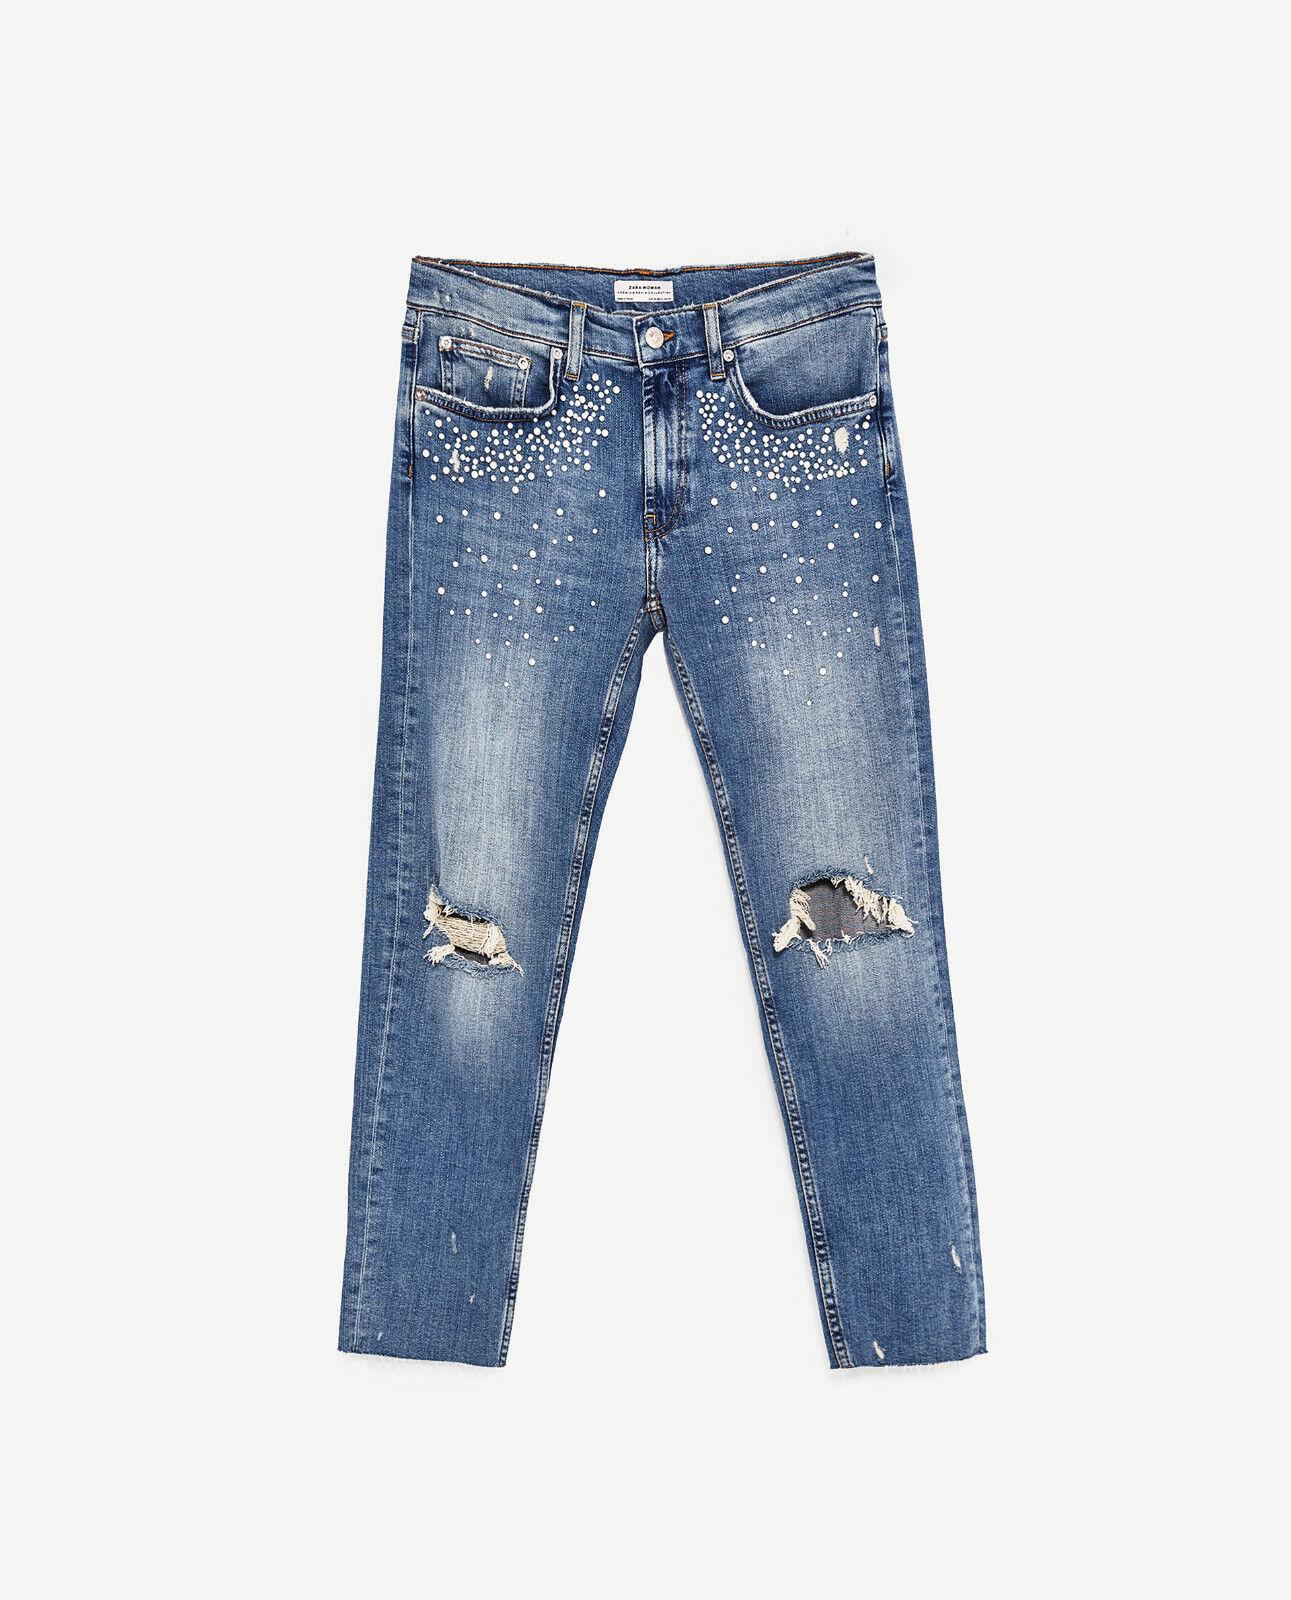 e435cb79 BNWT Zara blu slim fit Boyfriend Boyfriend Boyfriend jeans con perle  (Taglia 6) 5da8a4